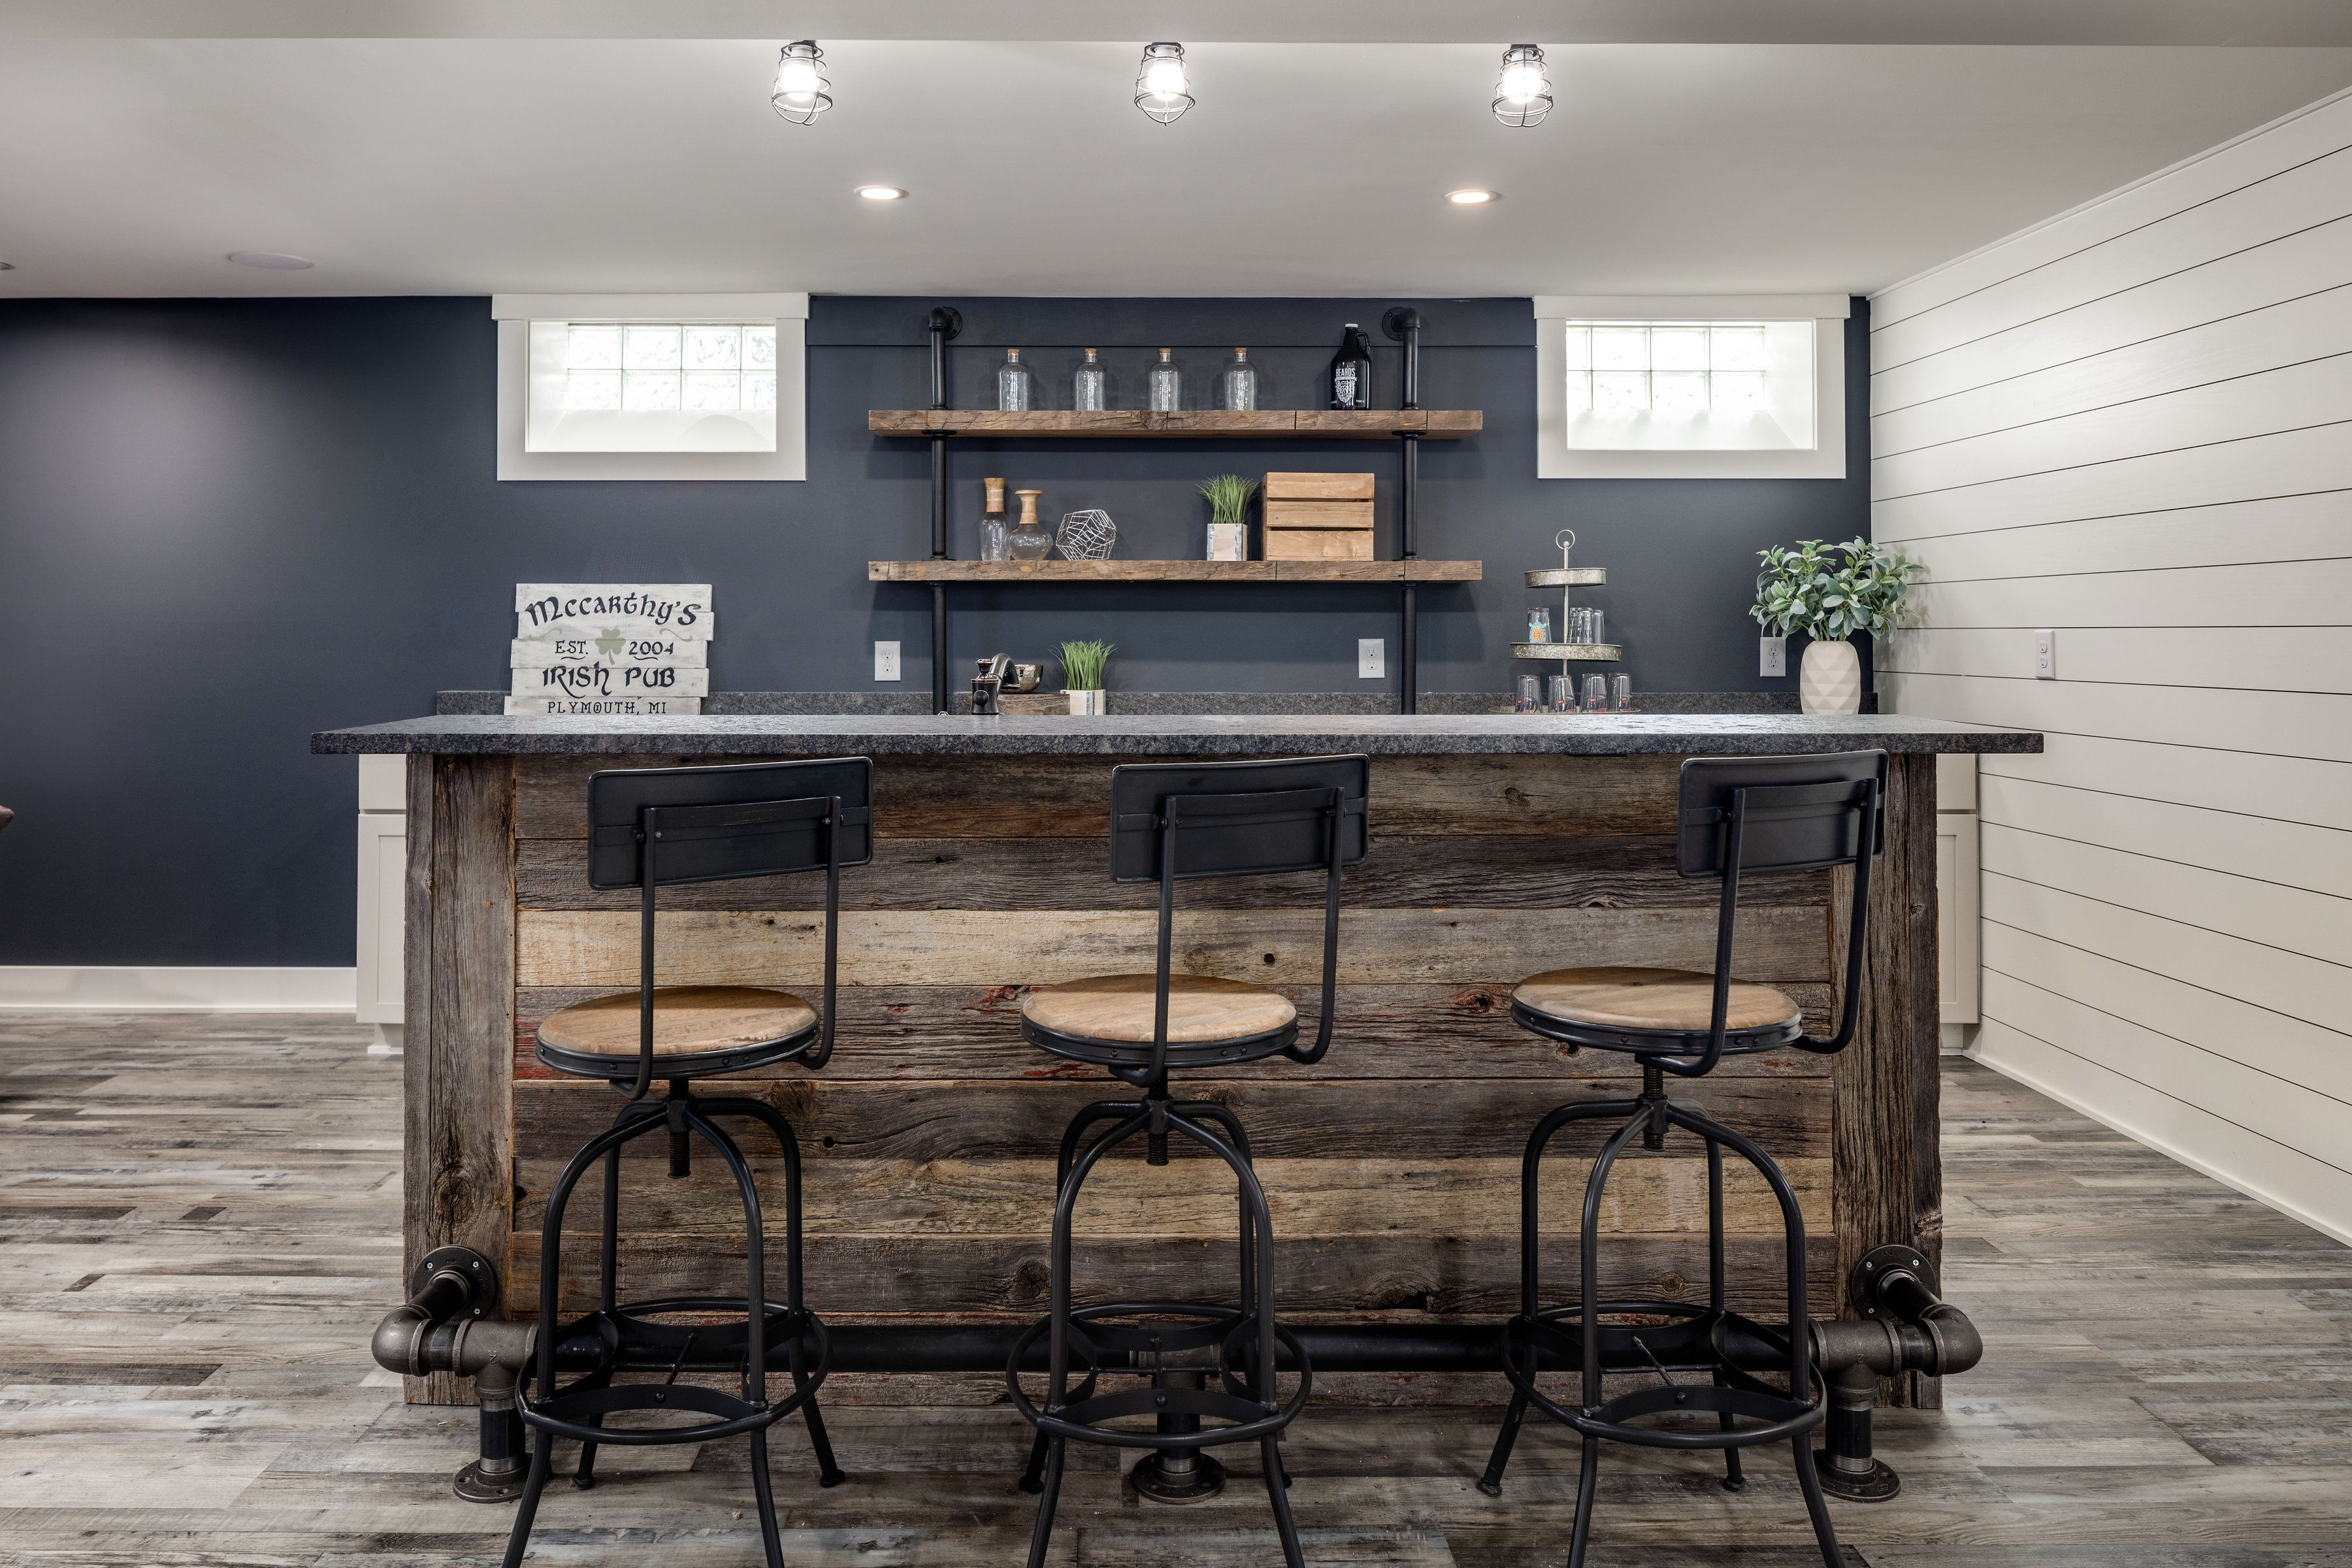 50 Insanely Cool Basement Bar Ideas For Your Home Small Basement Remodel Basement Bar Designs Basement Design